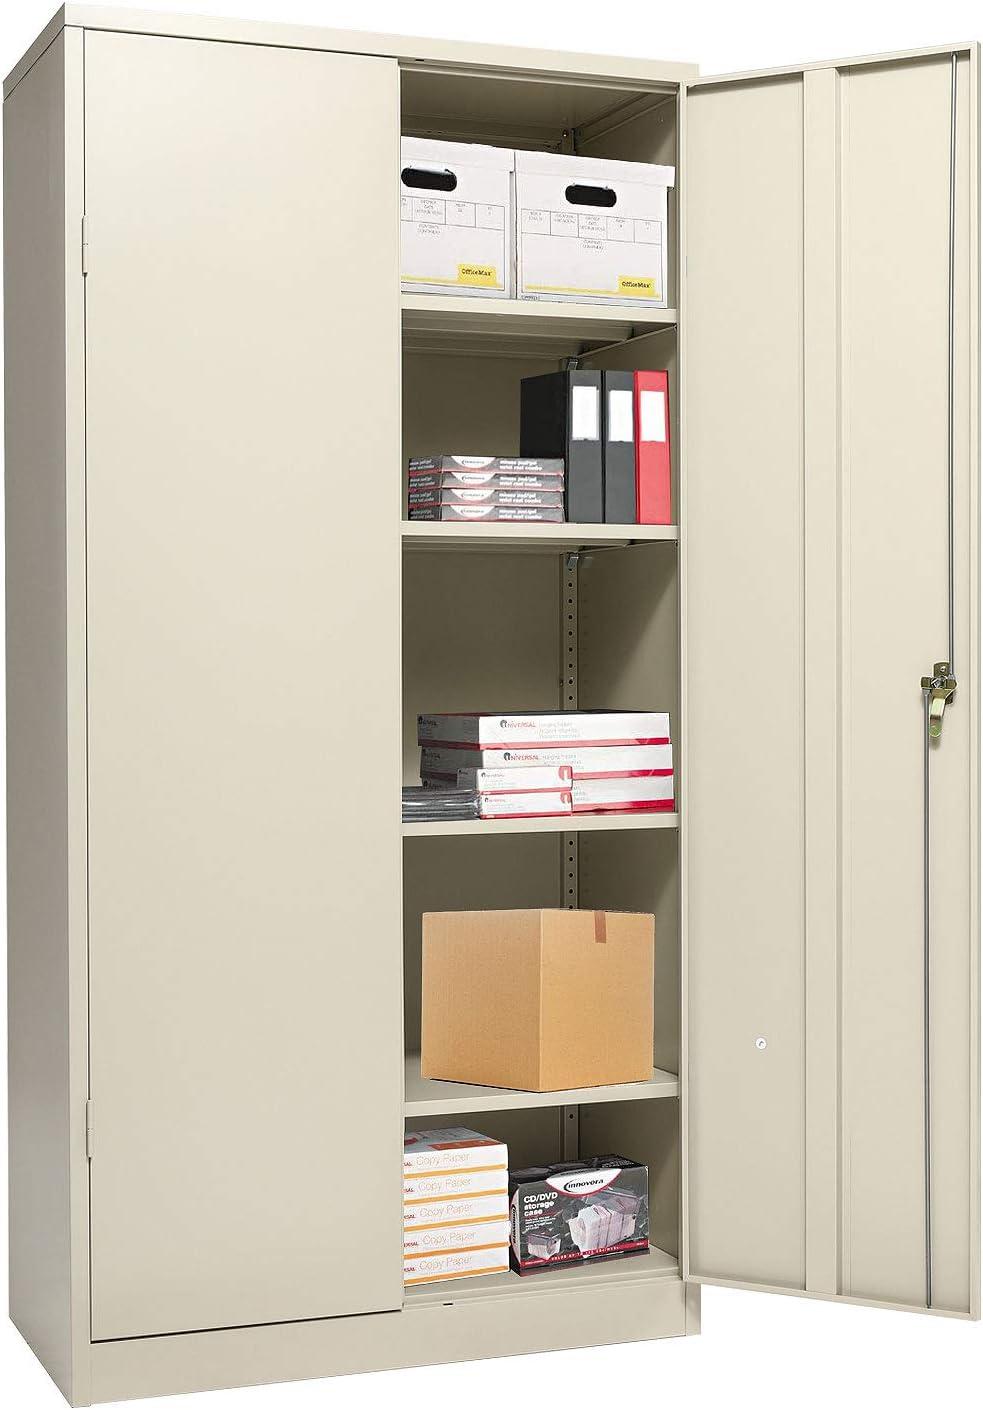 Metal Storage Cabinet with Locking Doors and 4 Adjustable Shelves, 72.05